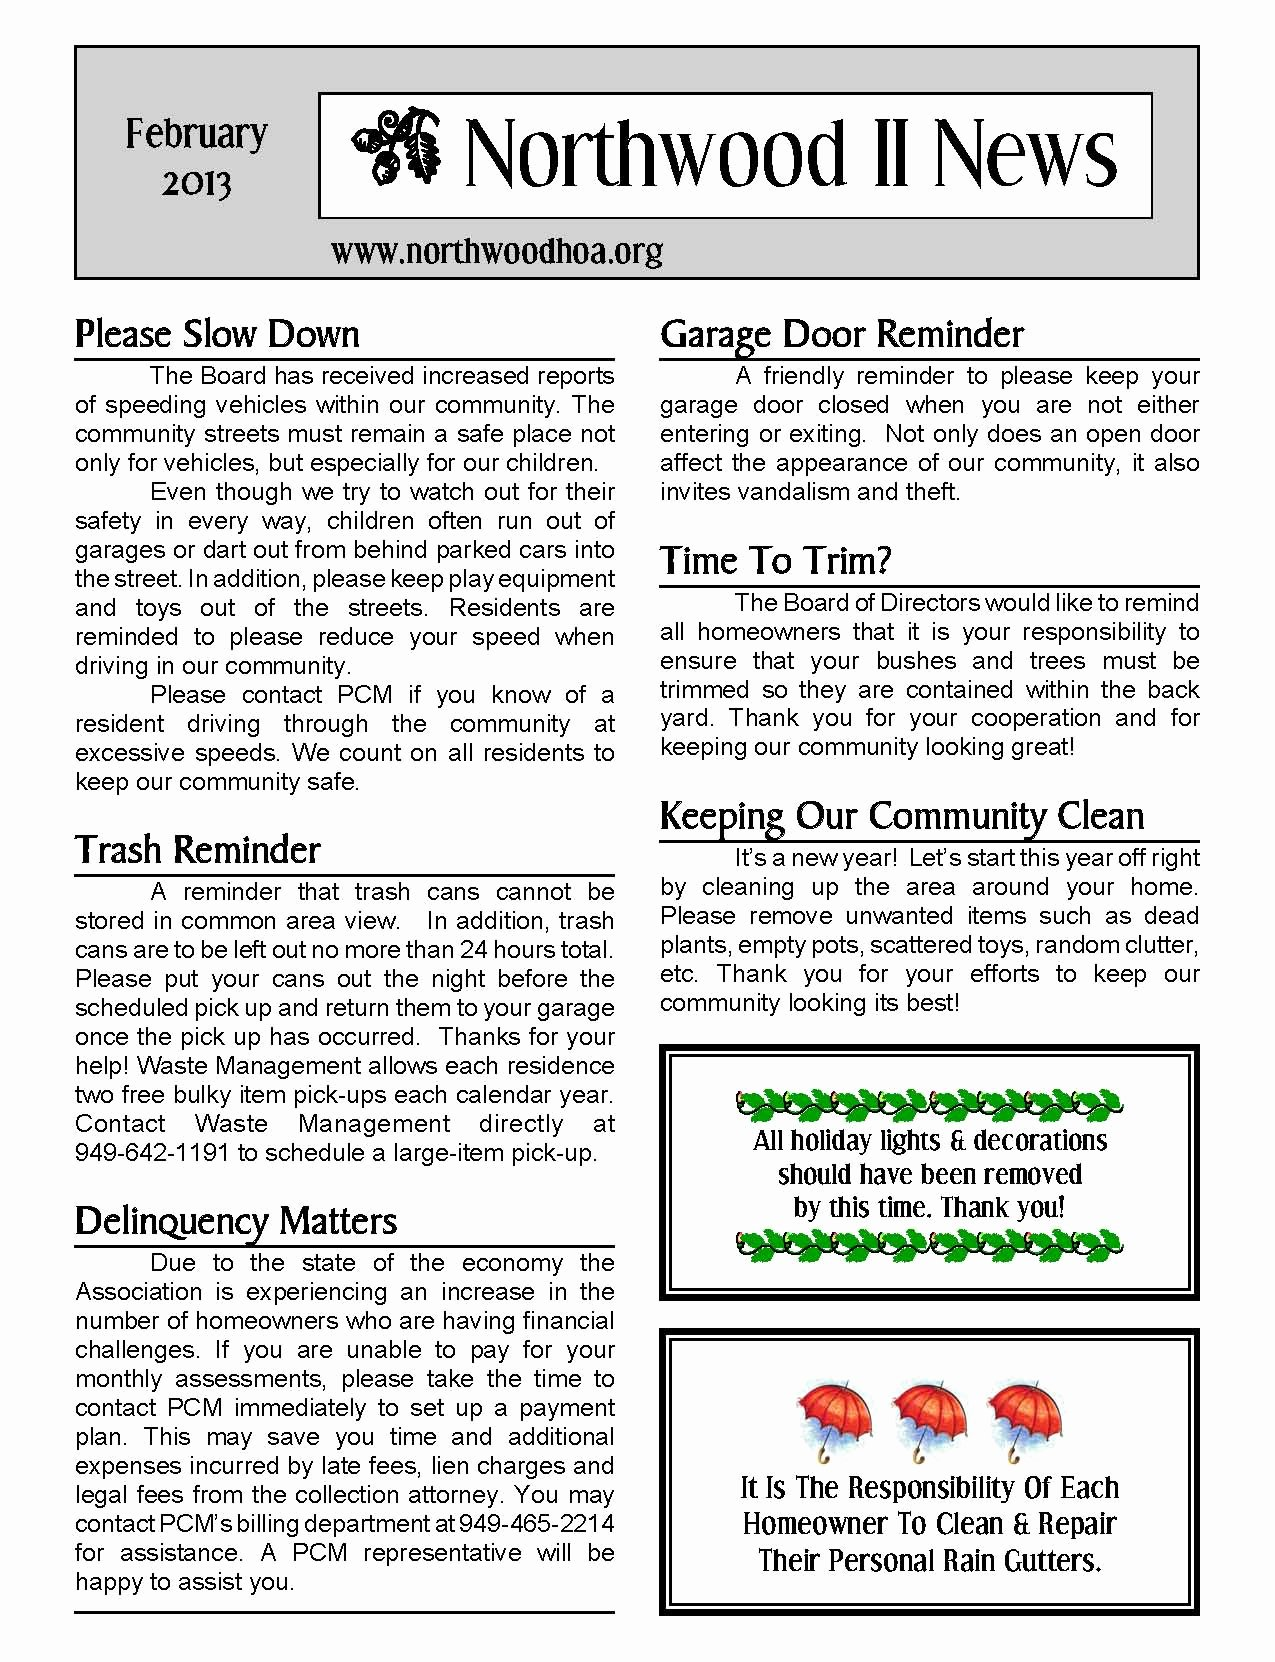 Homeowners association Newsletter Template New February 2013 – northwood Ii Nwii Hoa Munity